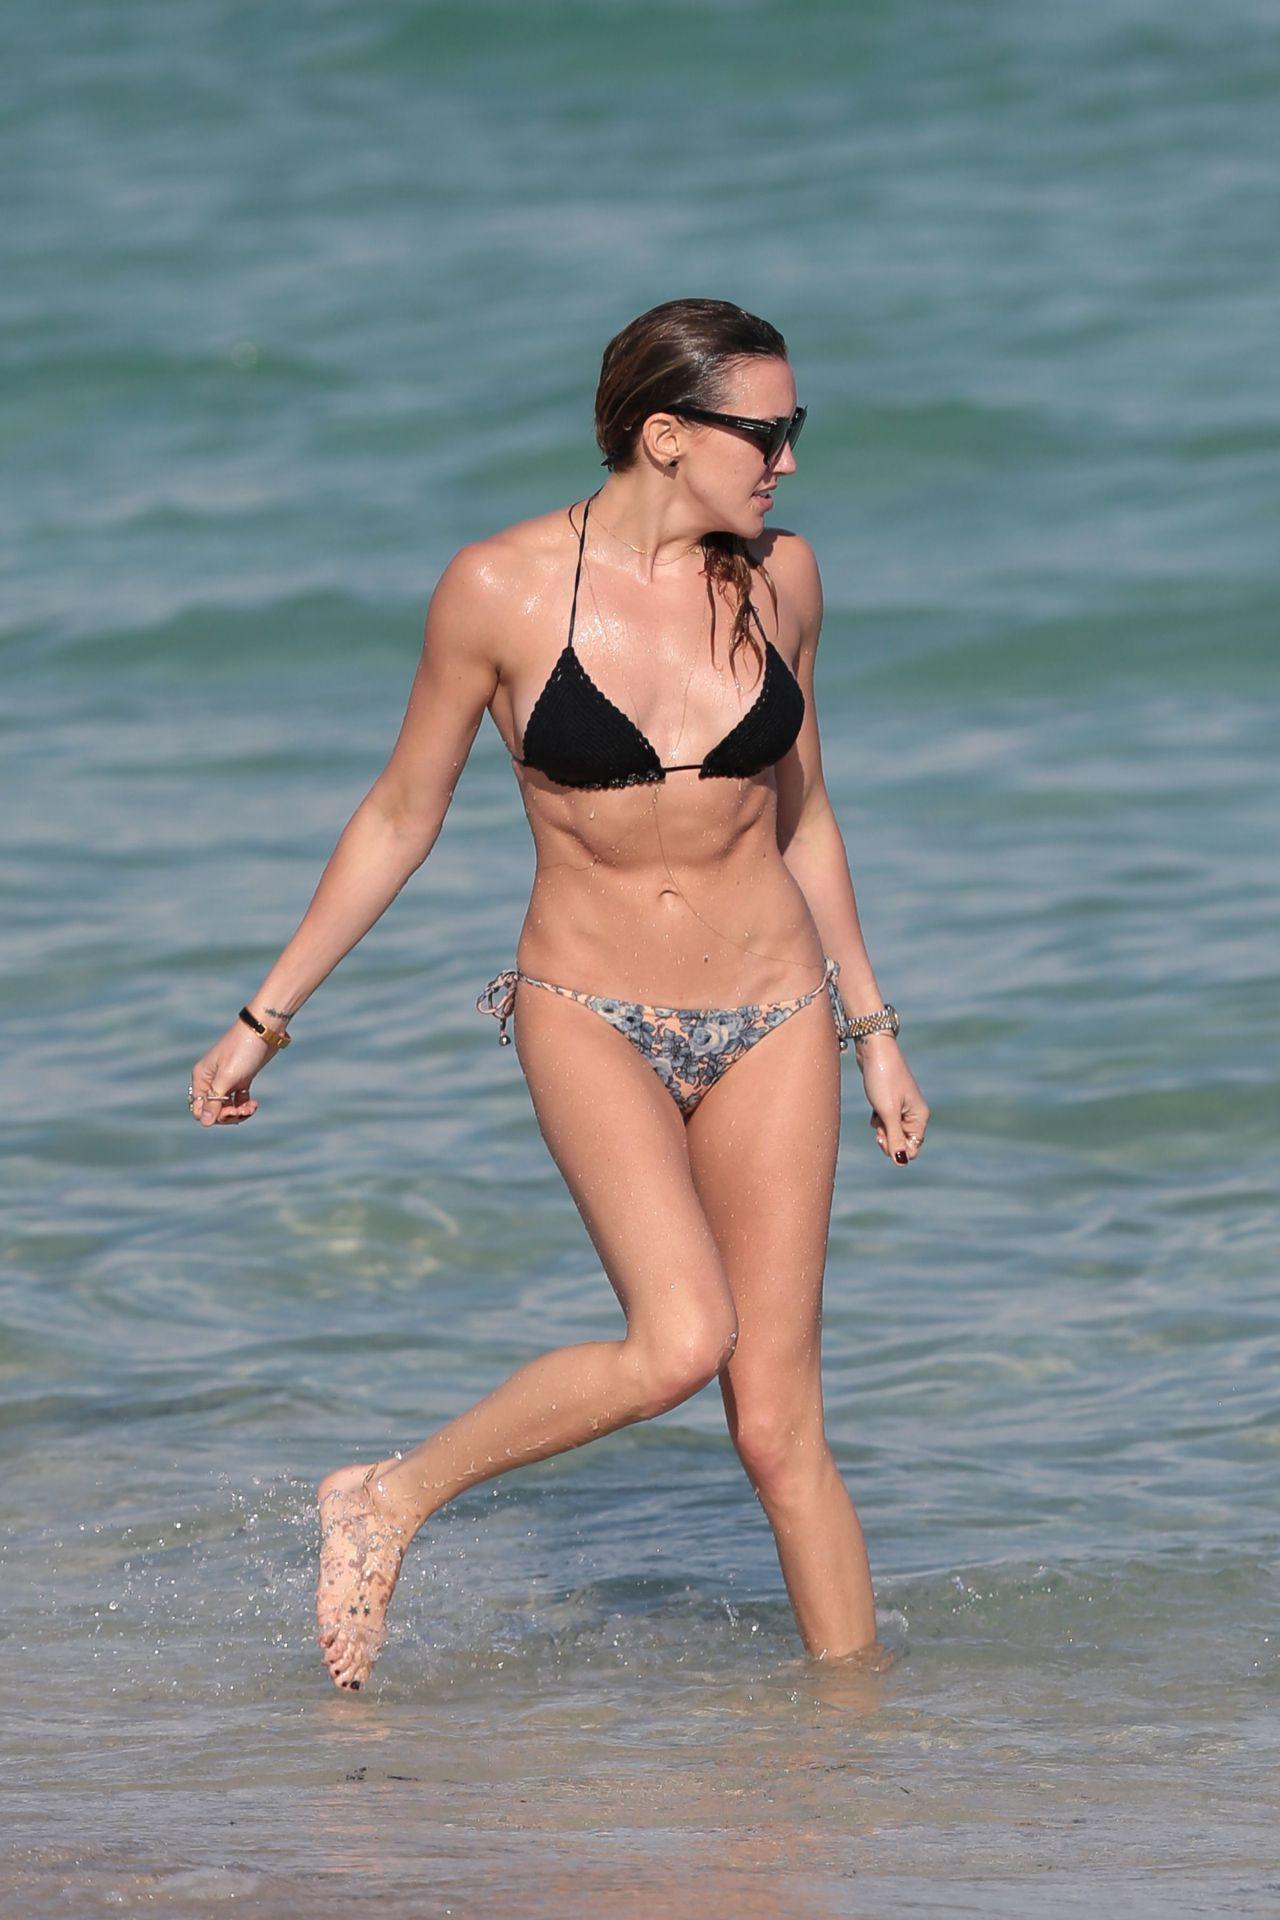 Katie Cassidy Bikini Candids At A Beach In Miami